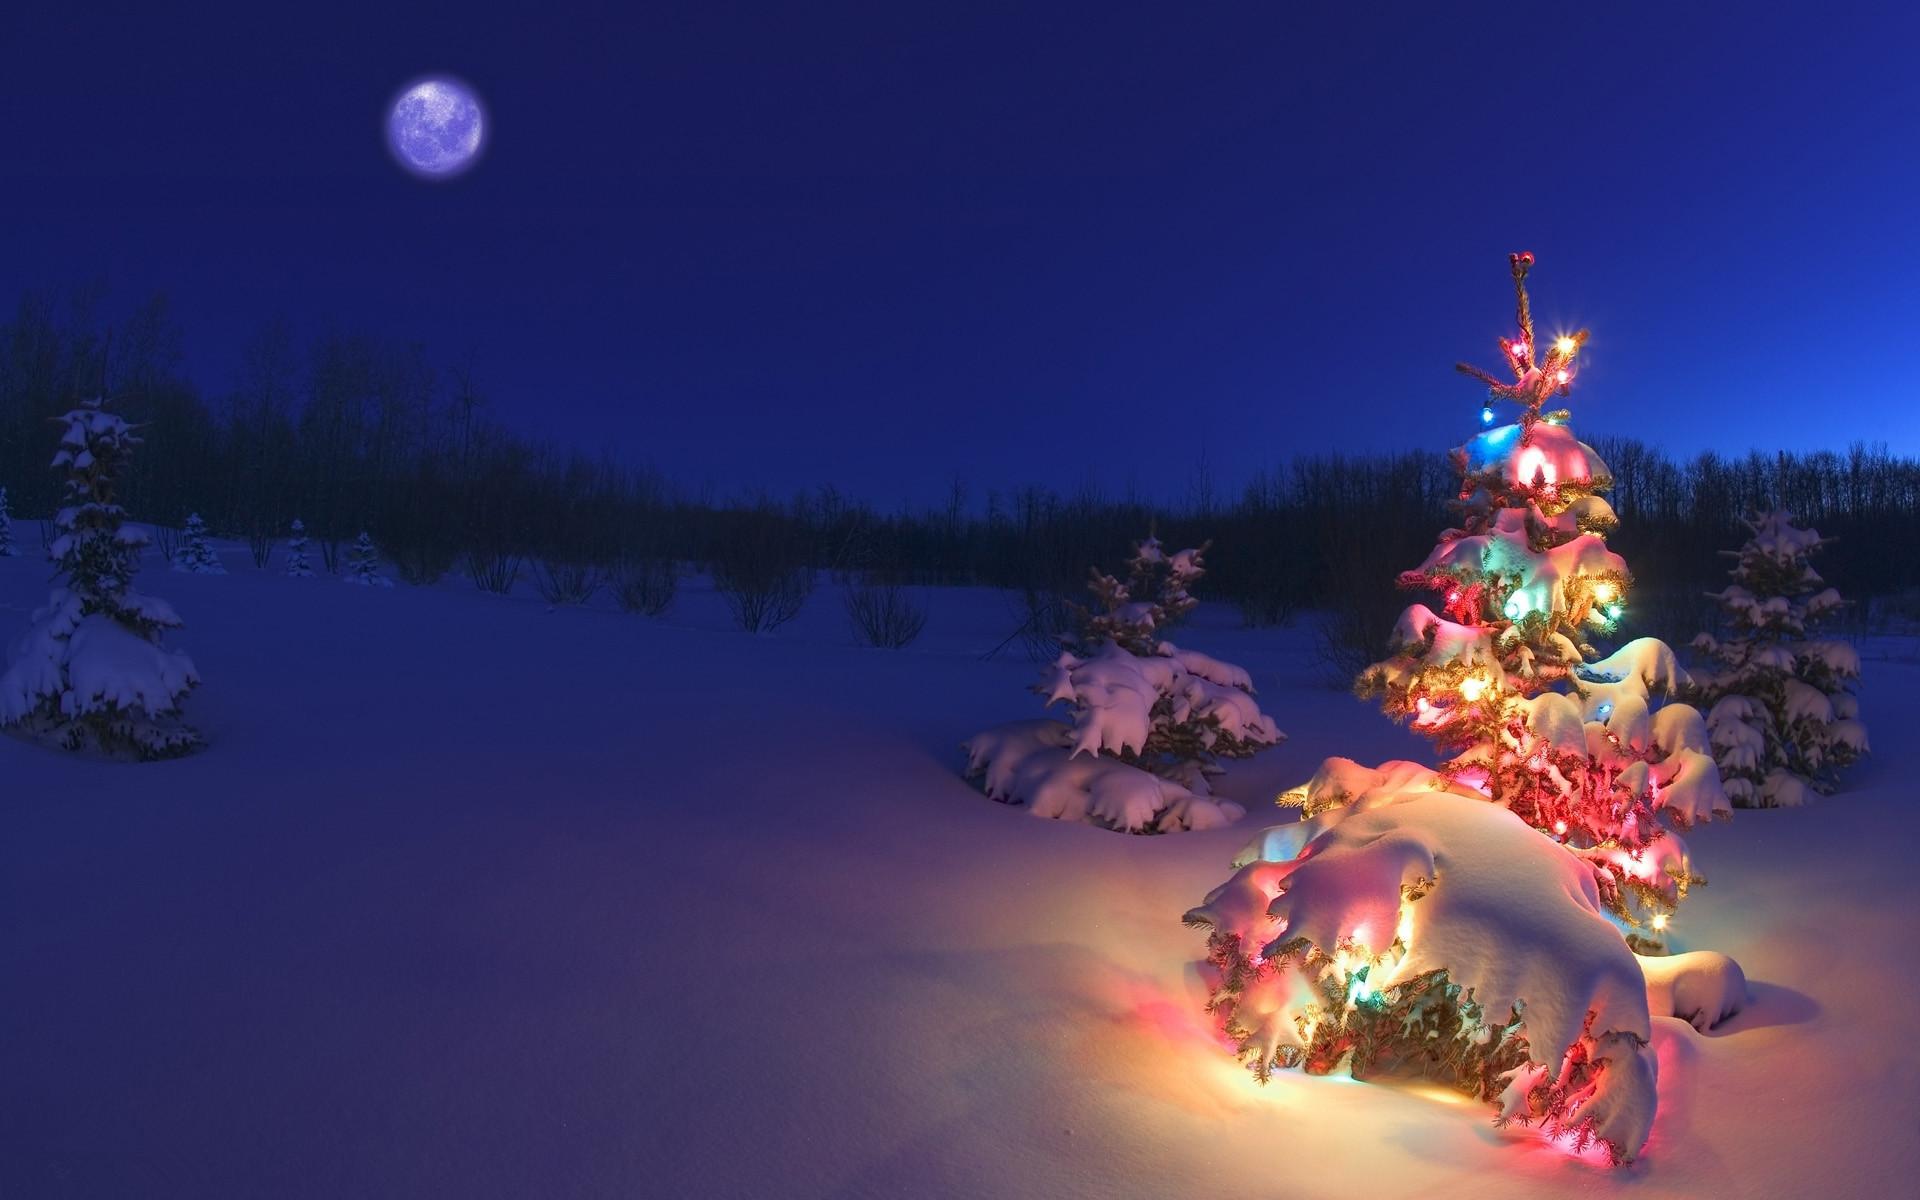 Kumpulan Gambar Ucapan Natal & Tahun Baru 2019 Cocok Untuk Dikirim via Whatsapp dan Facebook